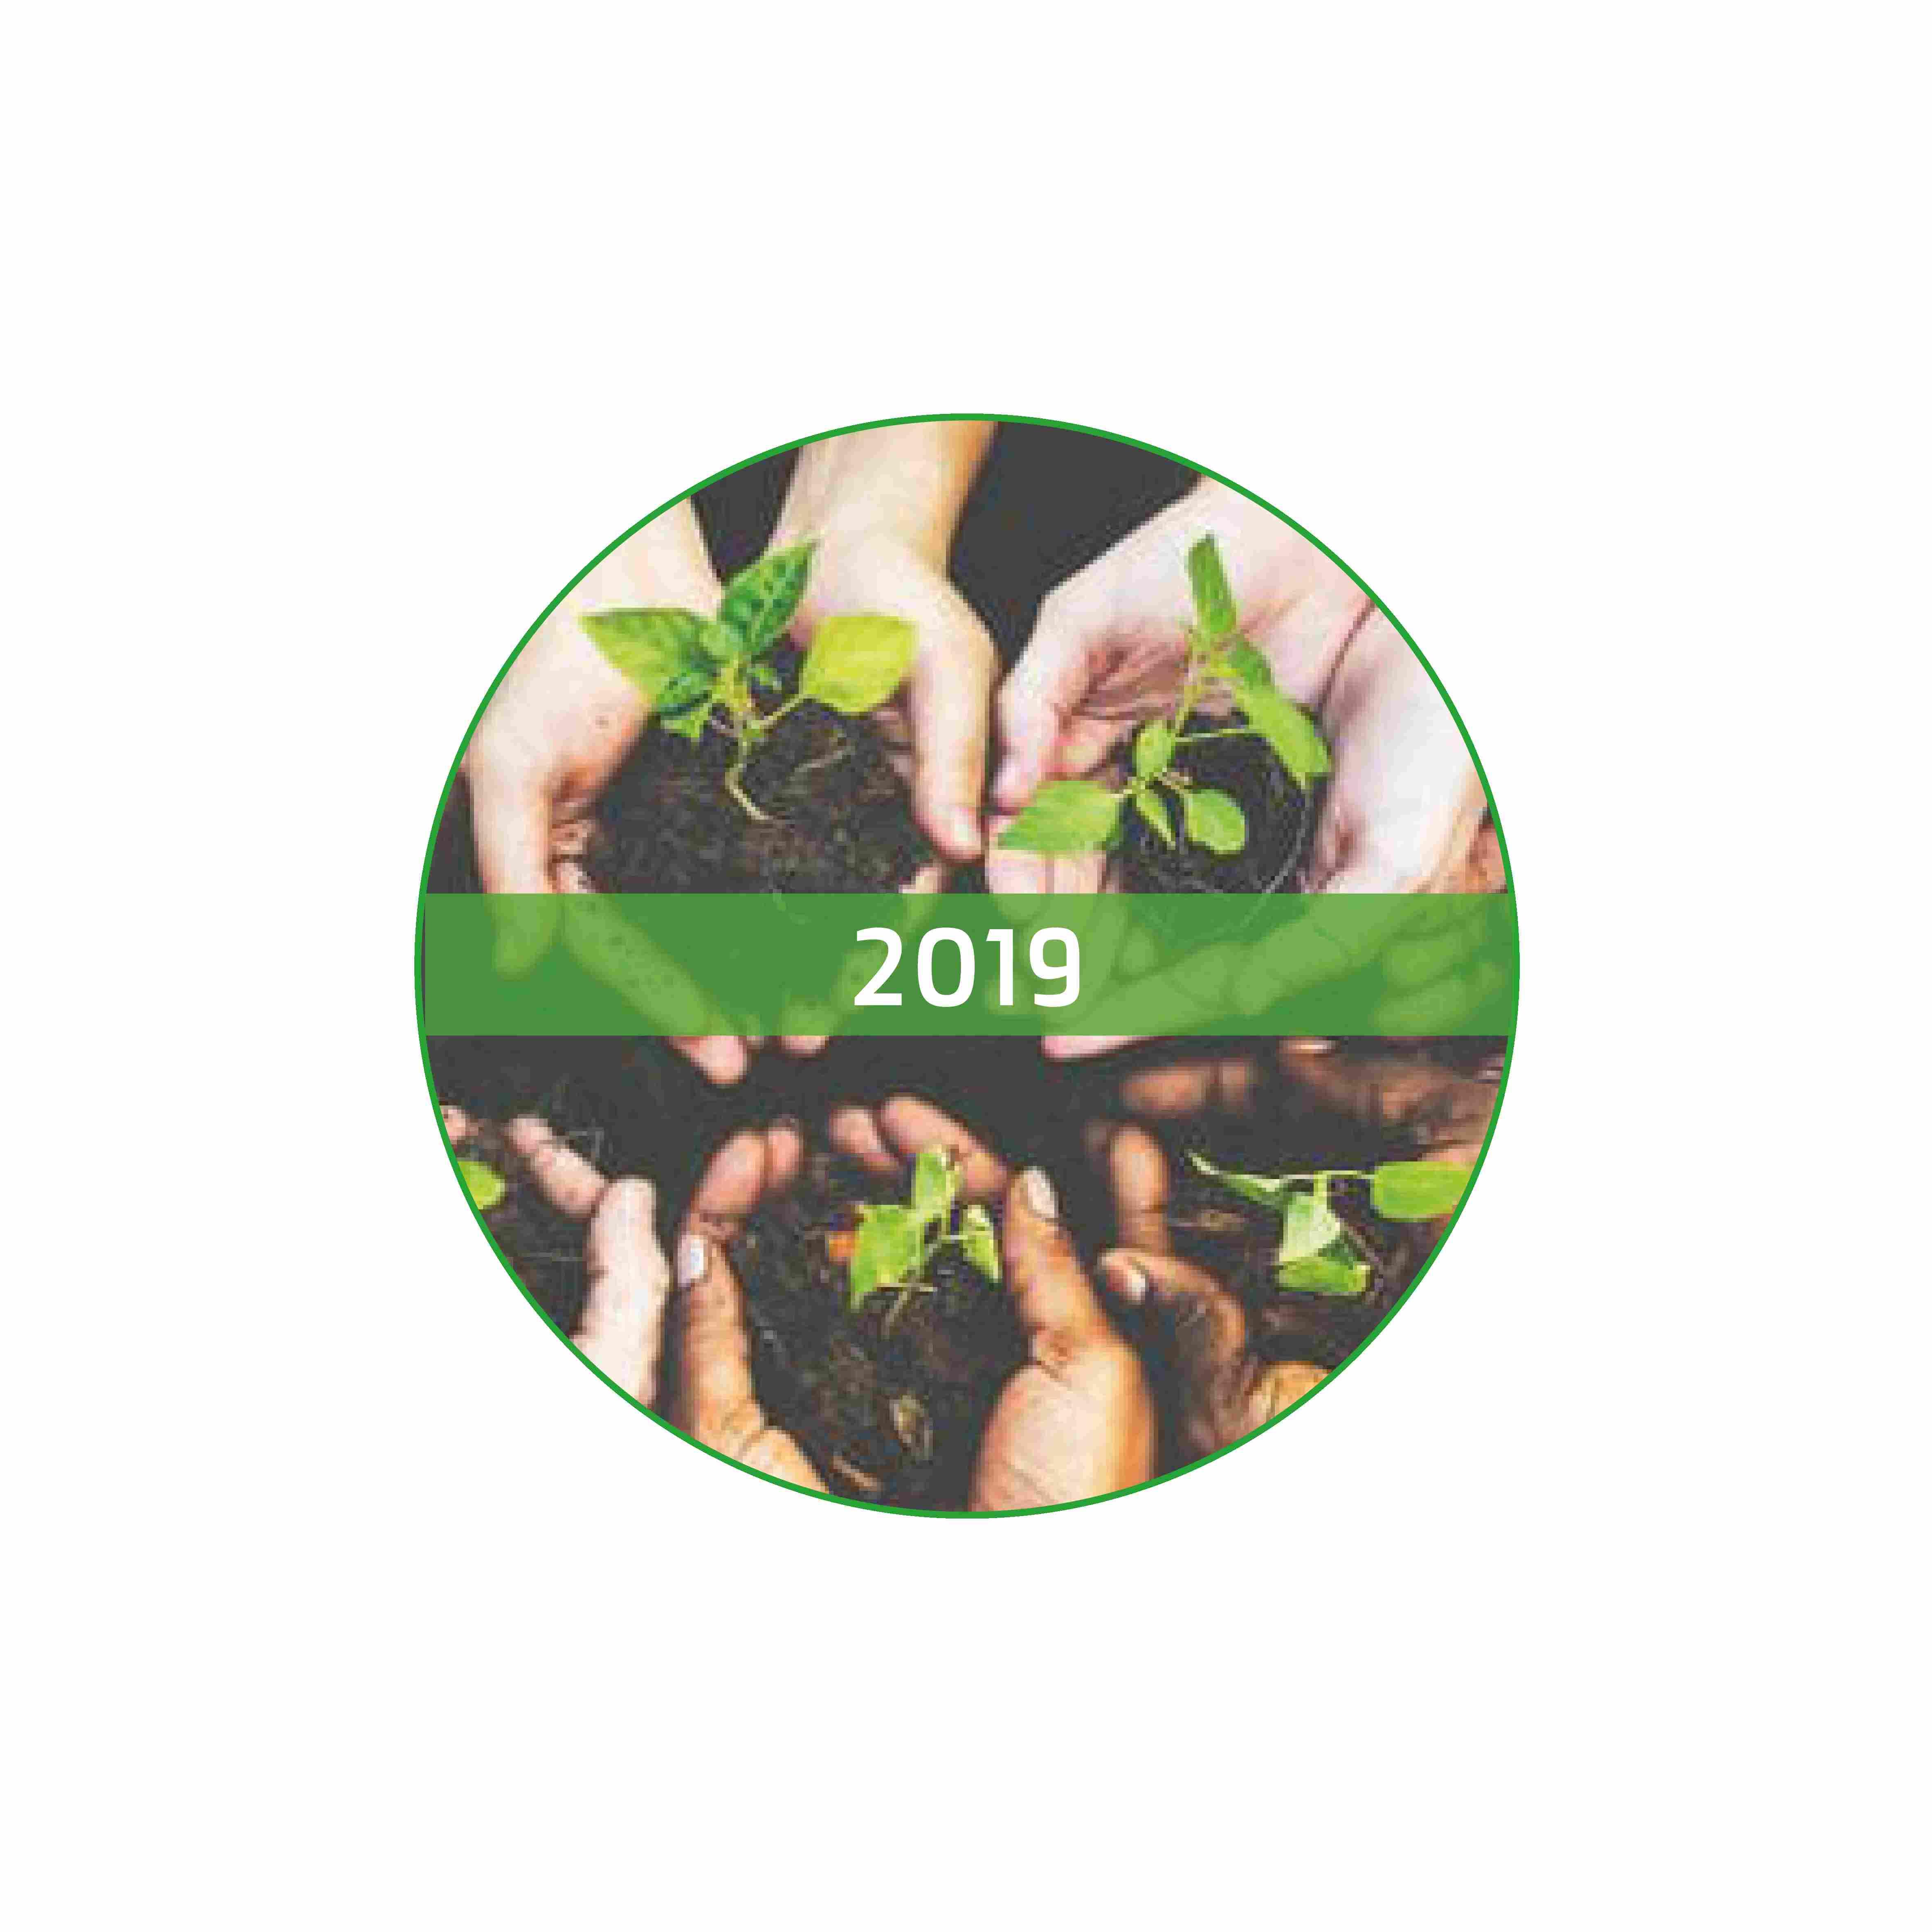 Programme de travail 2019